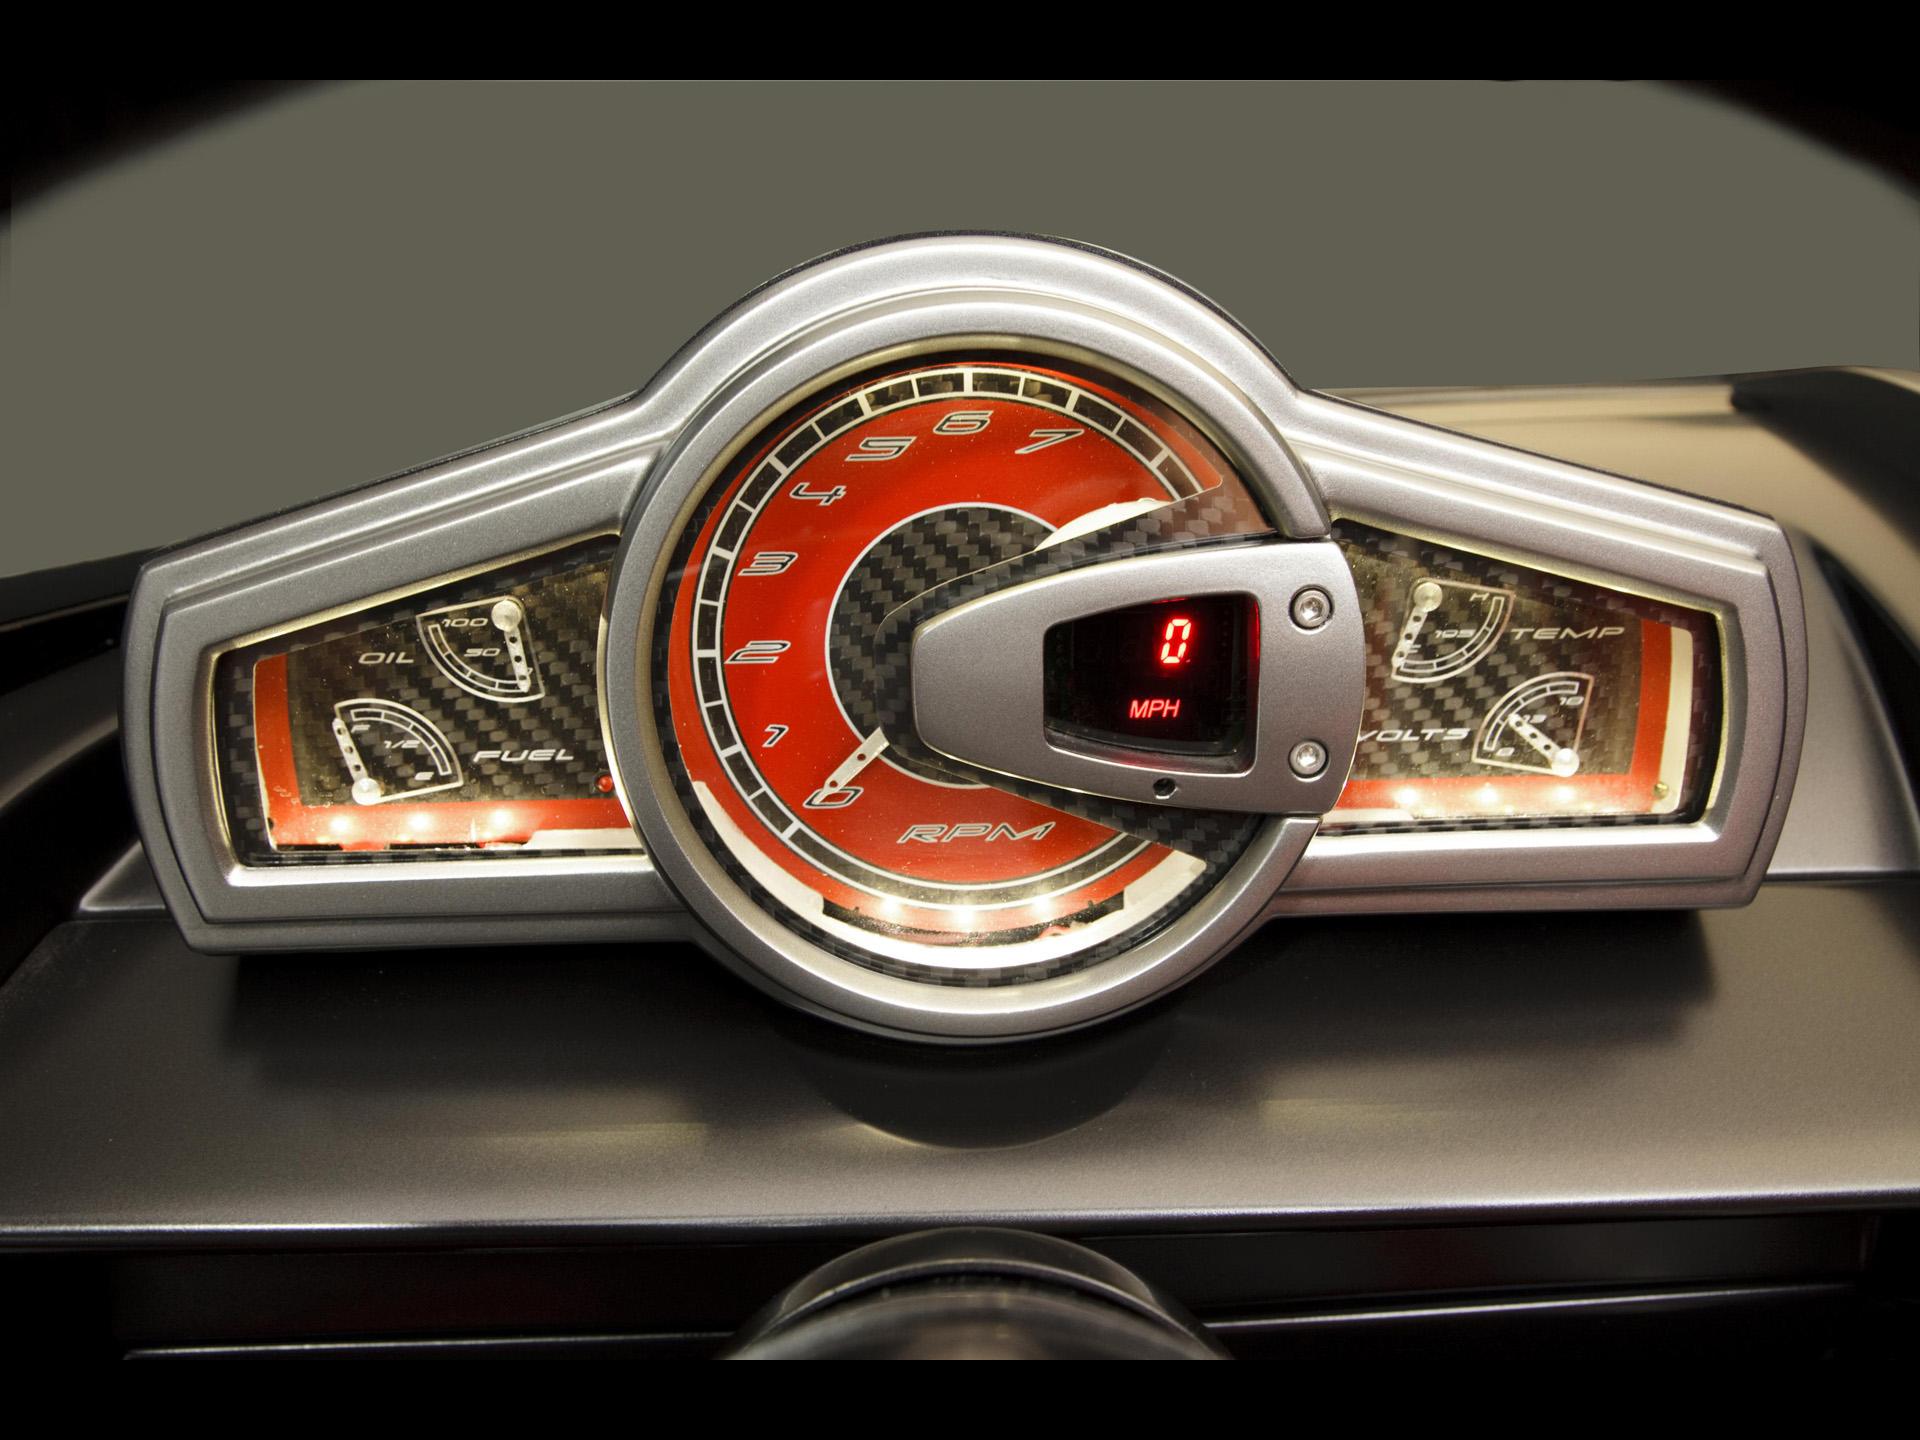 25 Images To Describe 1962 Chevrolet Corvette C1 RS